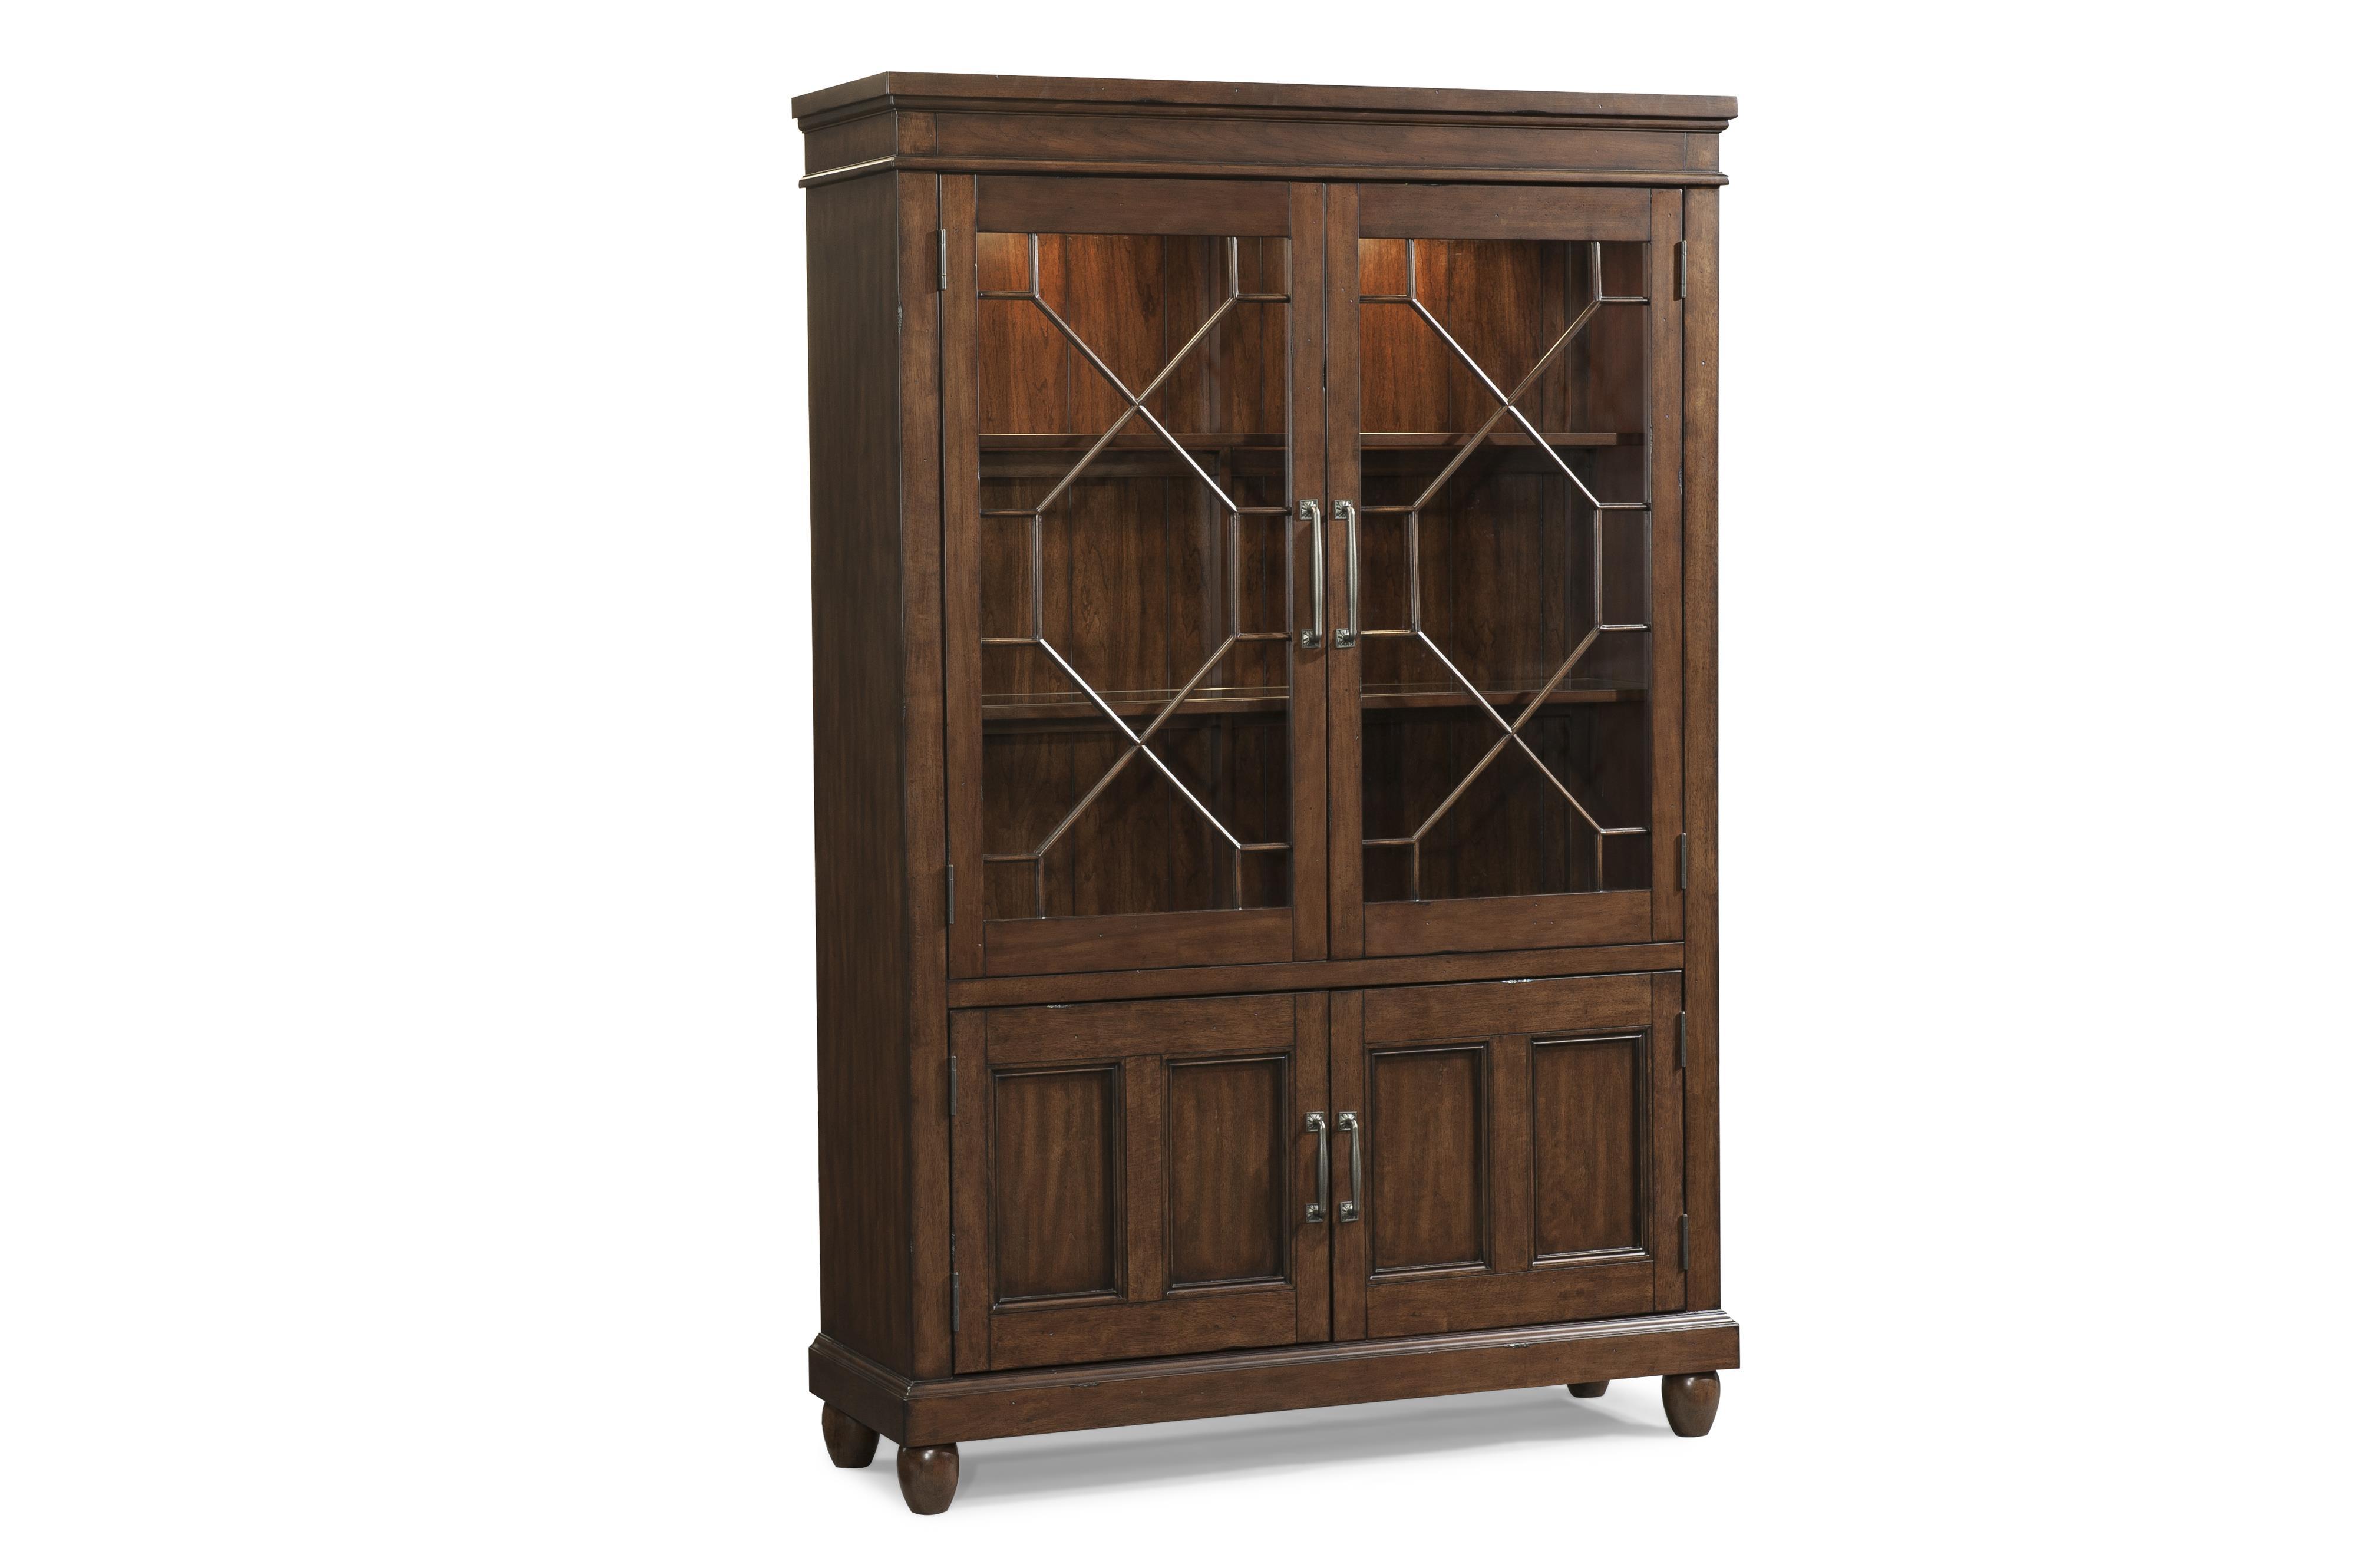 Easton Collection Blue Ridge Dining Room Curio - Item Number: 426-892 CURI